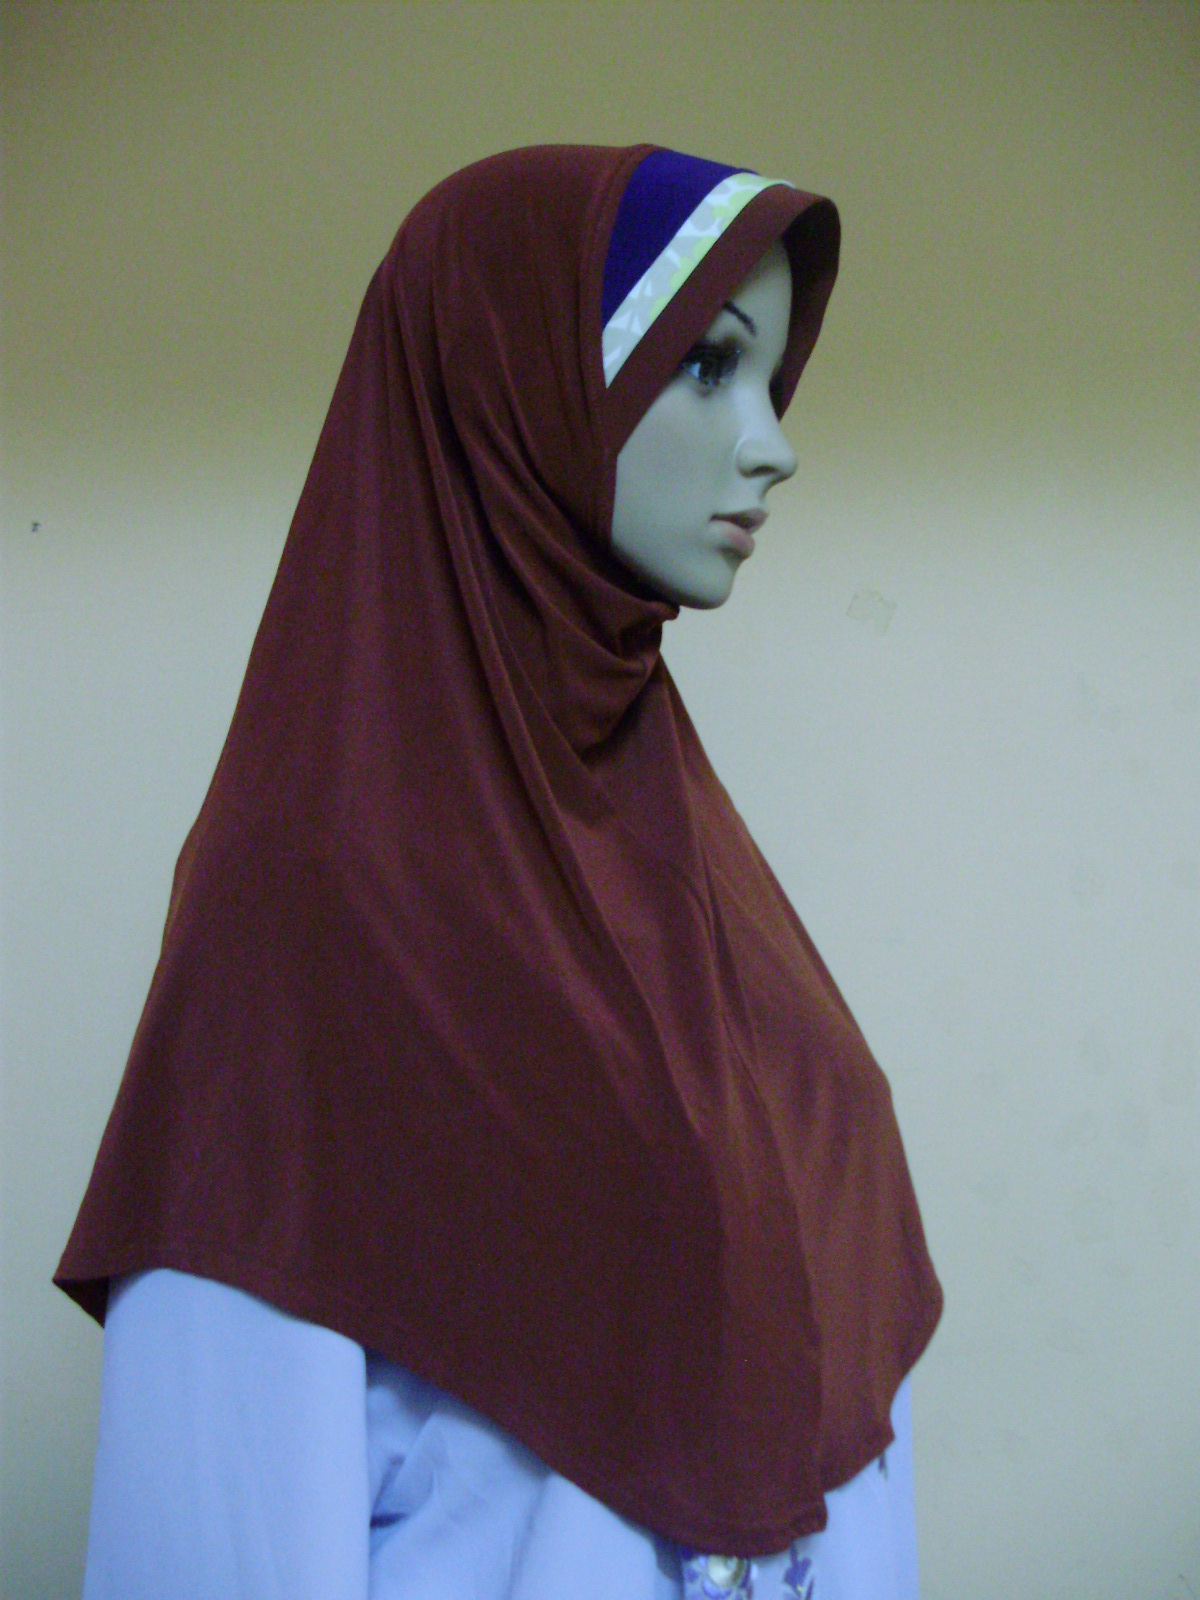 Tudung putih baju maroon projek di pondok - 3 7